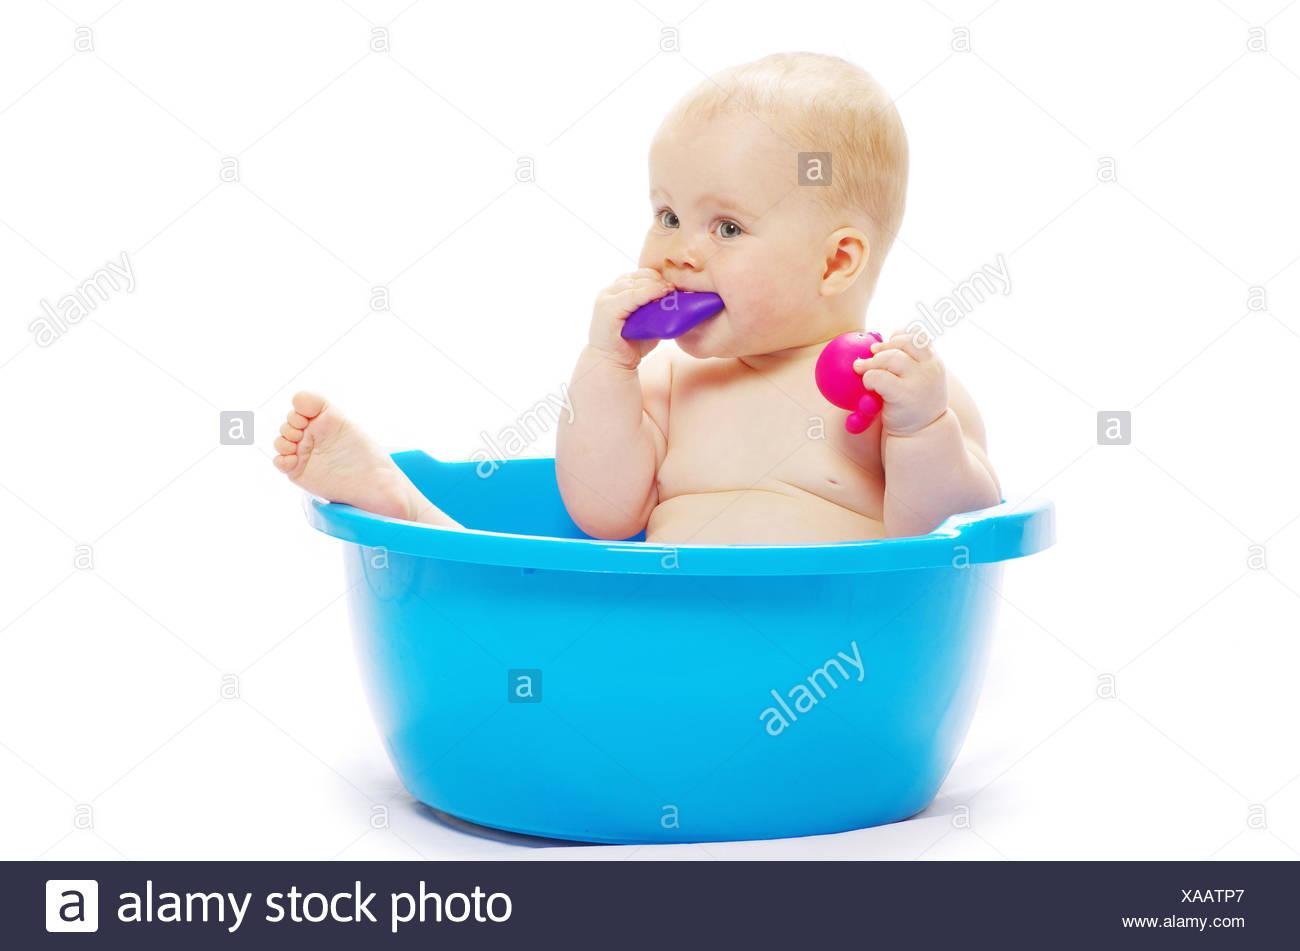 Attractive Baby In A Tub Crest - Bathtub Ideas - dilata.info